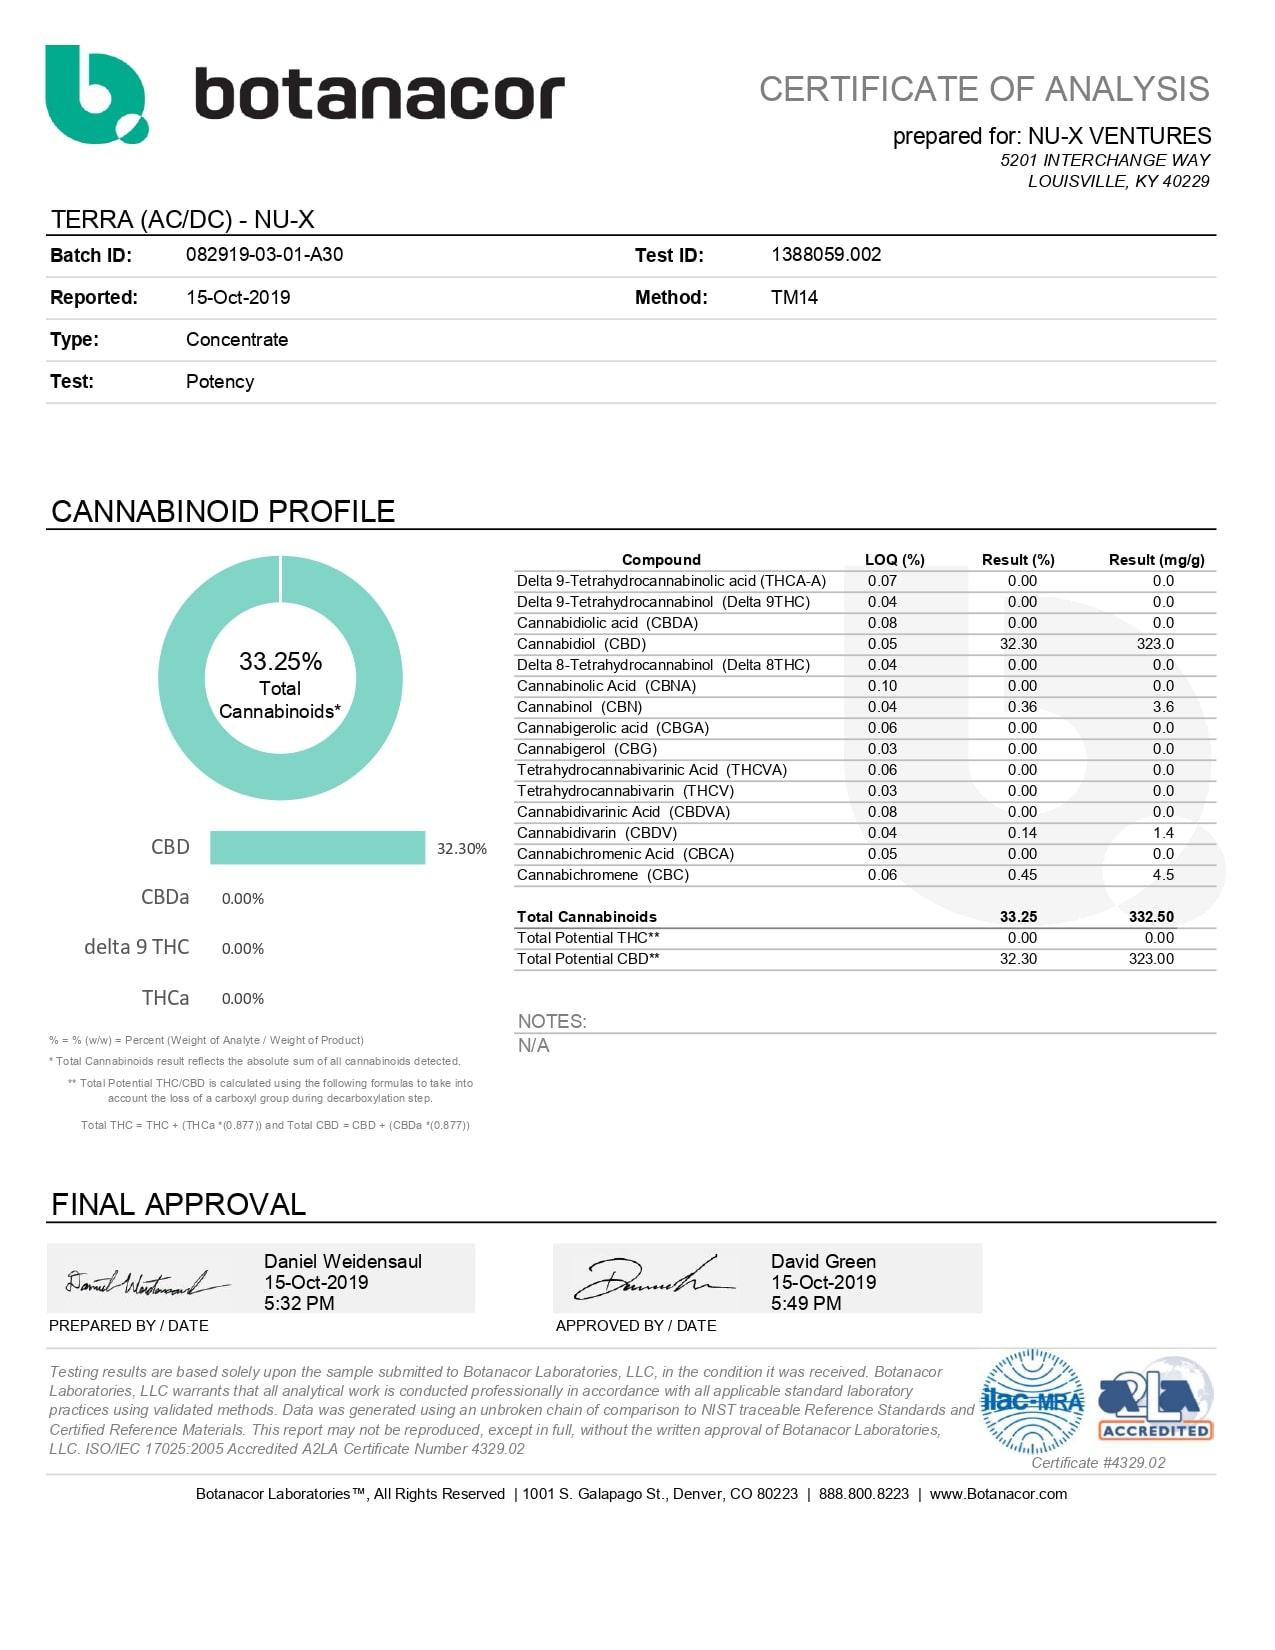 NU-X CBD (AC/DC) Terra Lab Report Disposable Vape Pen